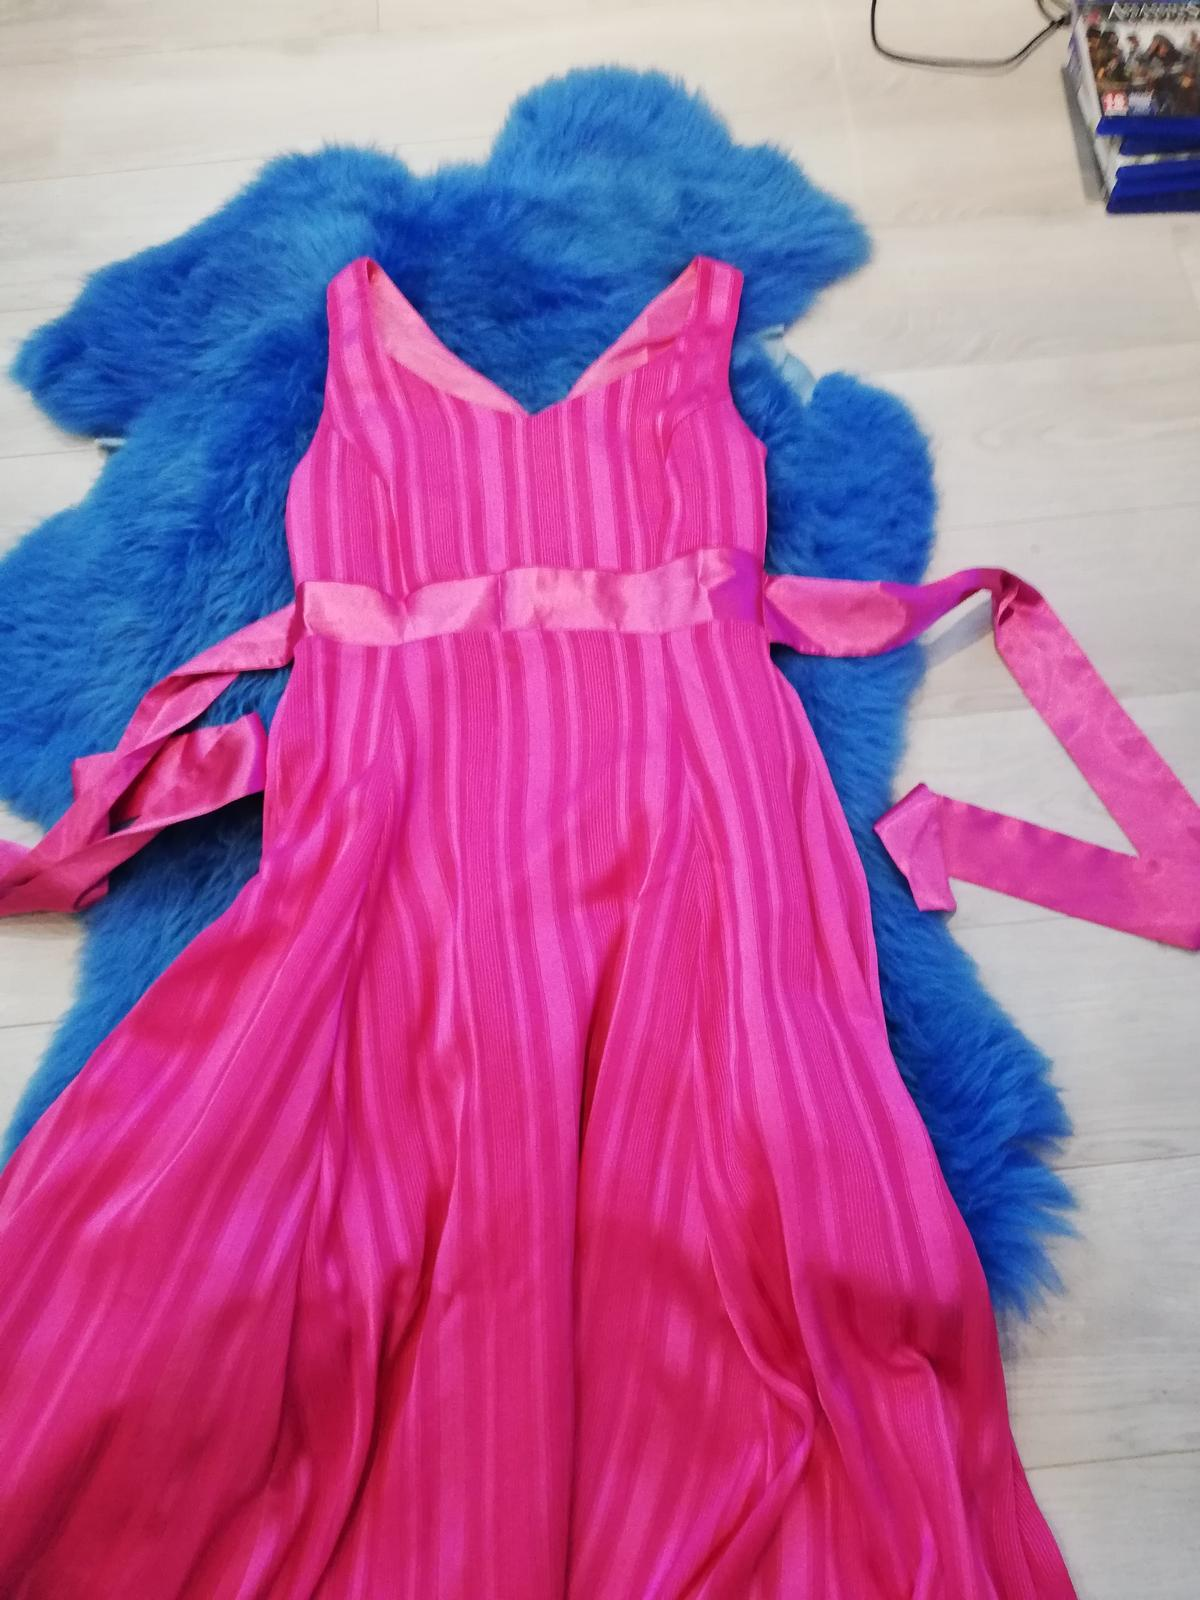 Cyklaménové šaty  - Obrázok č. 3